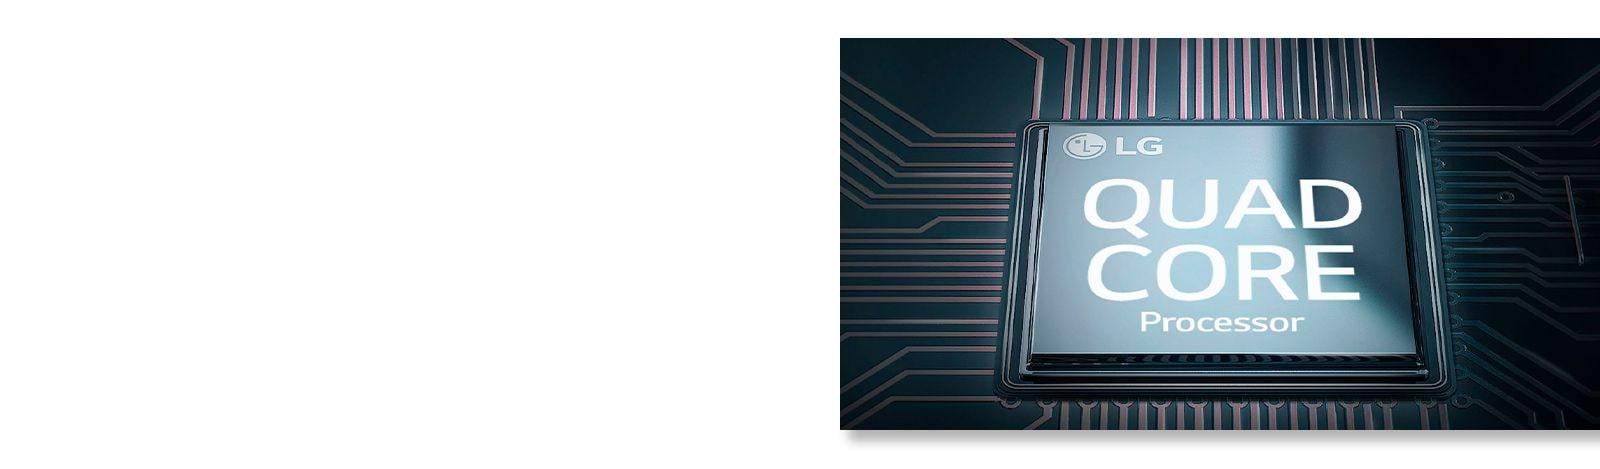 Quad-Core-Processor-Feature-Banner_RHS_1600x469